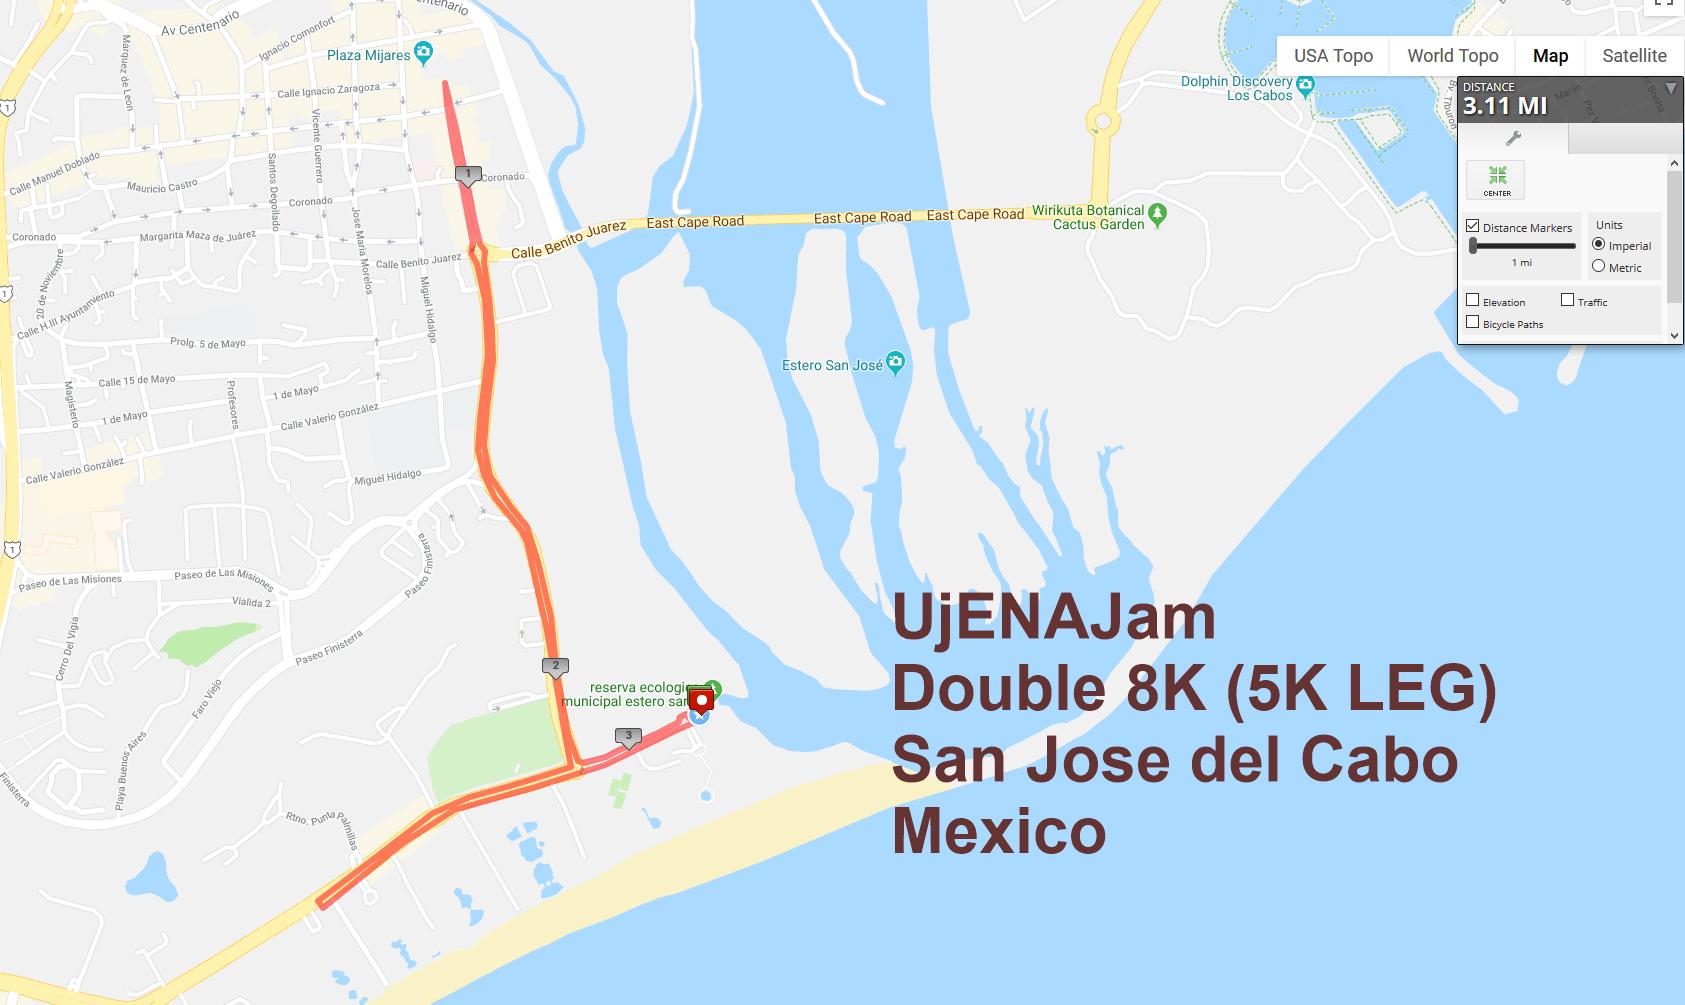 Cabo Double 8K 5K Leg